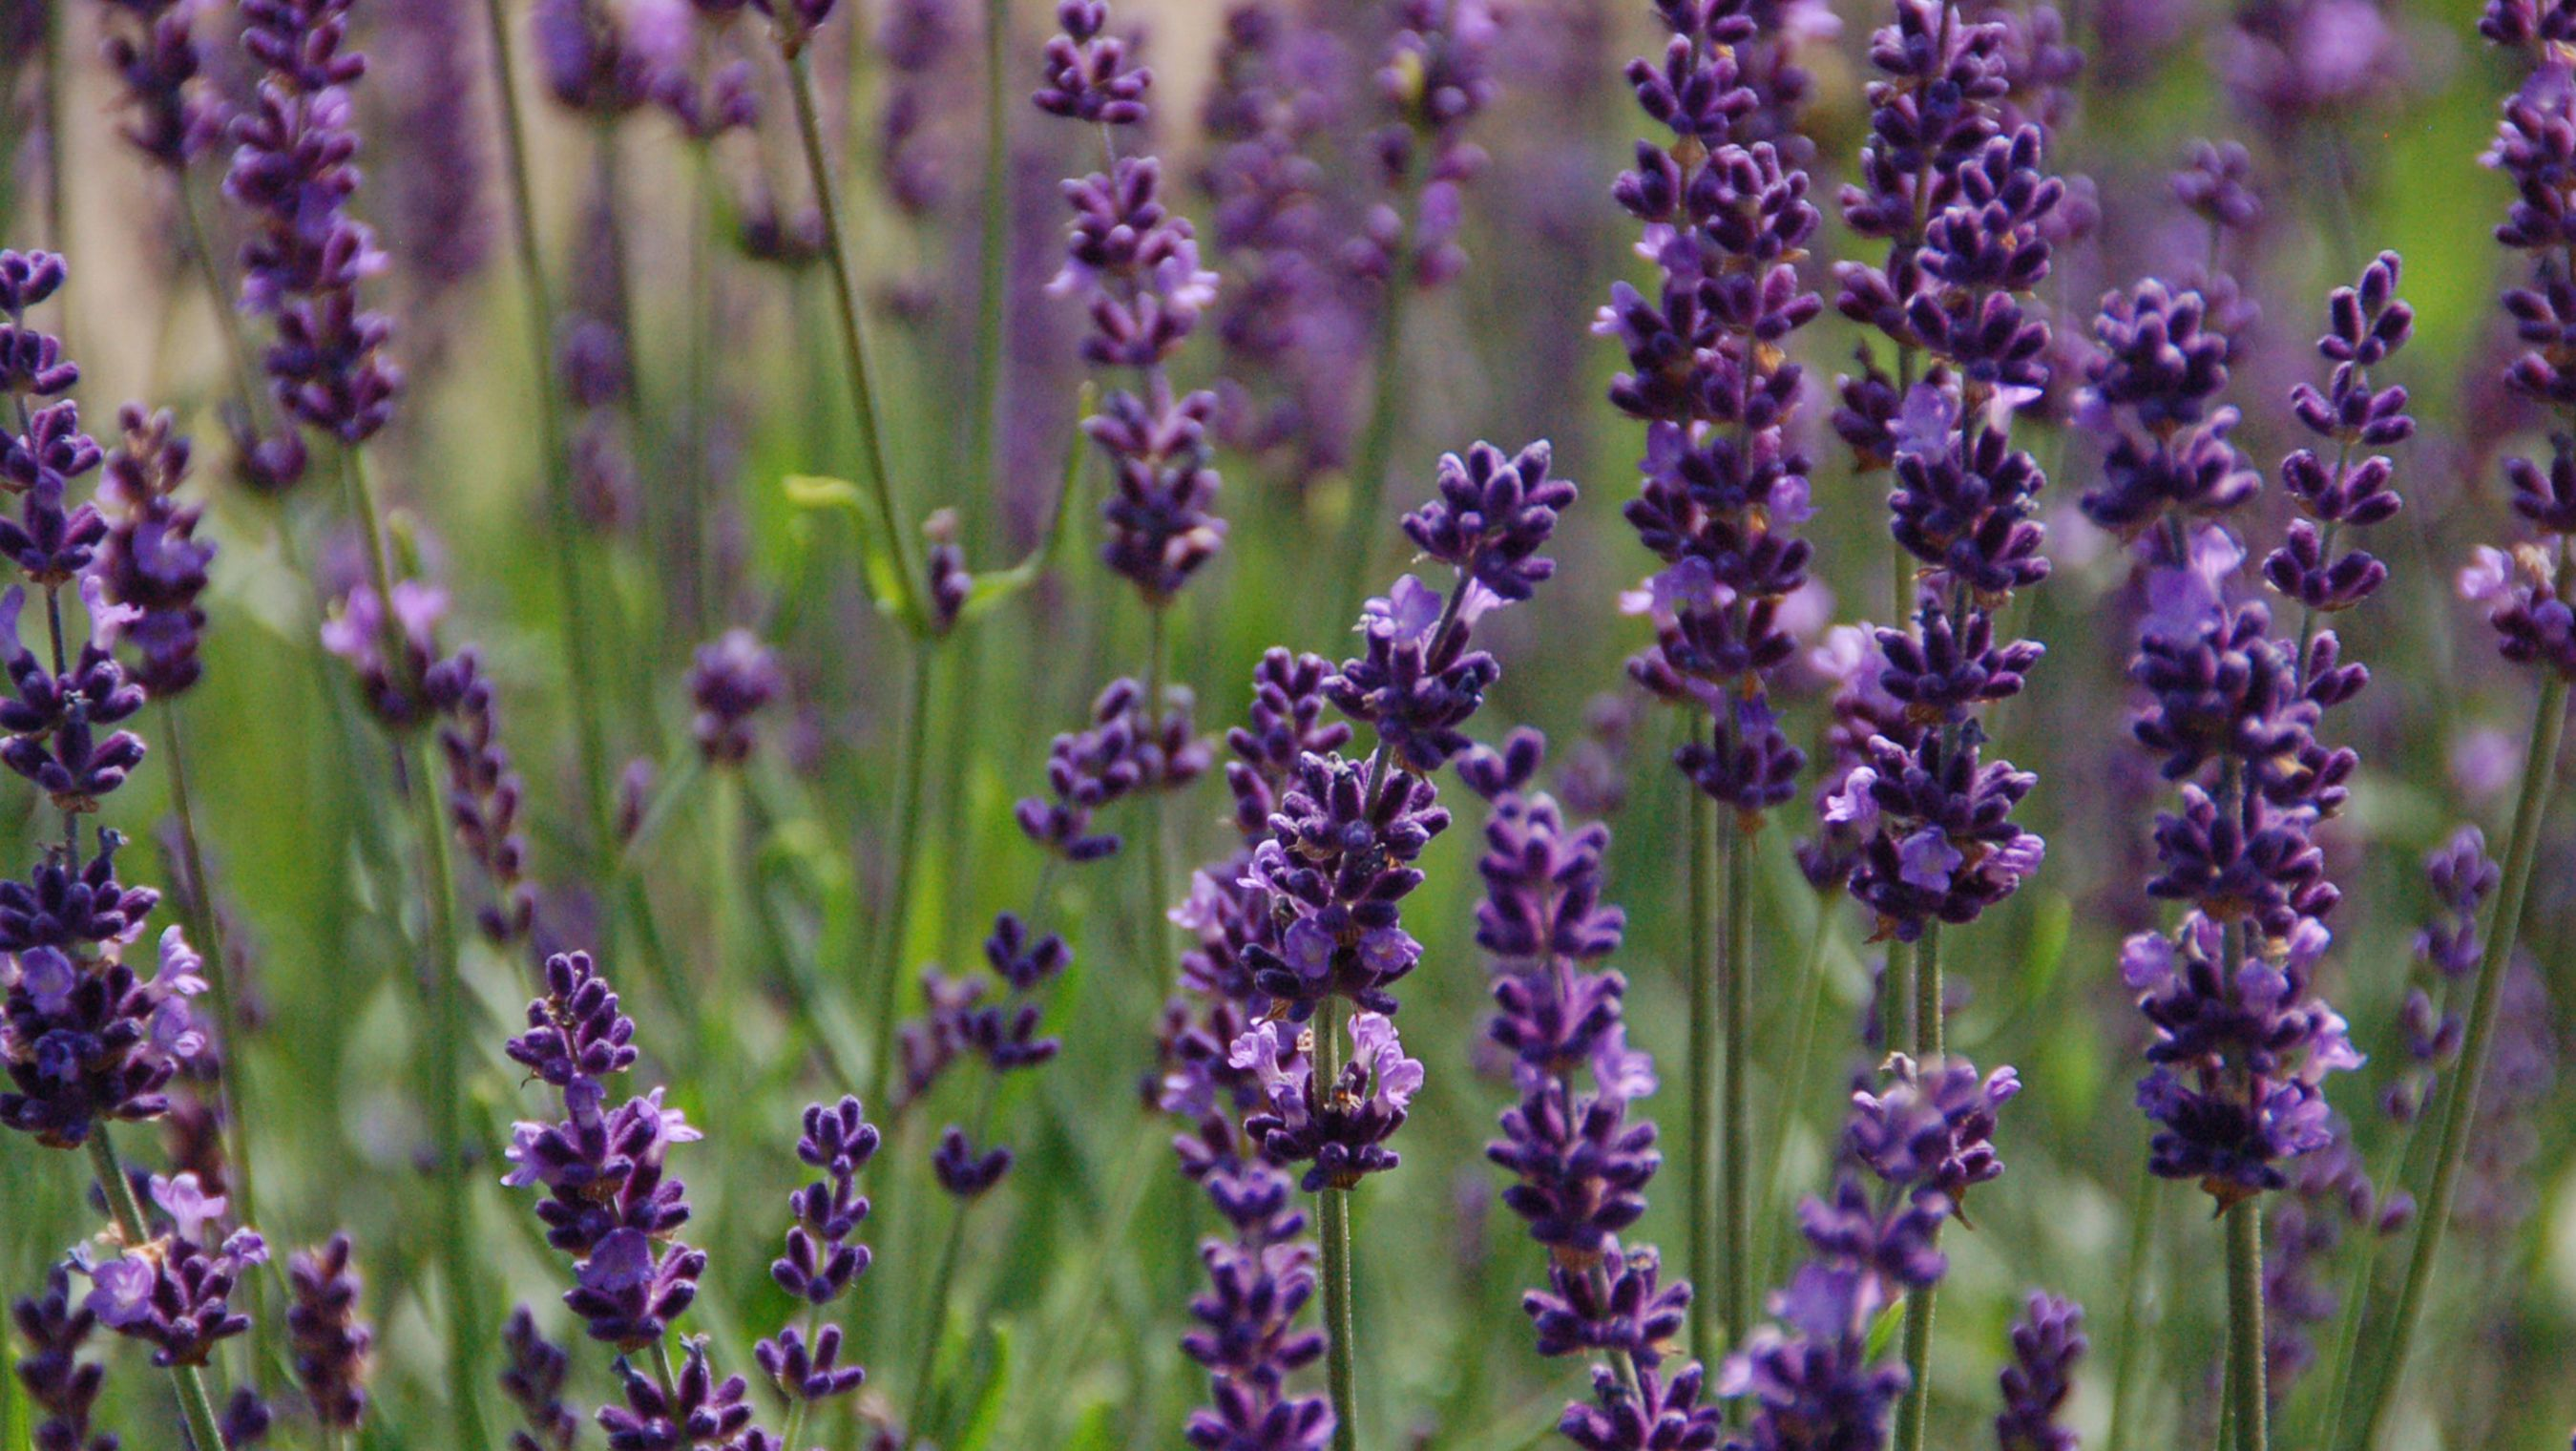 Gardeners love lavender for scent, flavor | The Hoosier Gardener